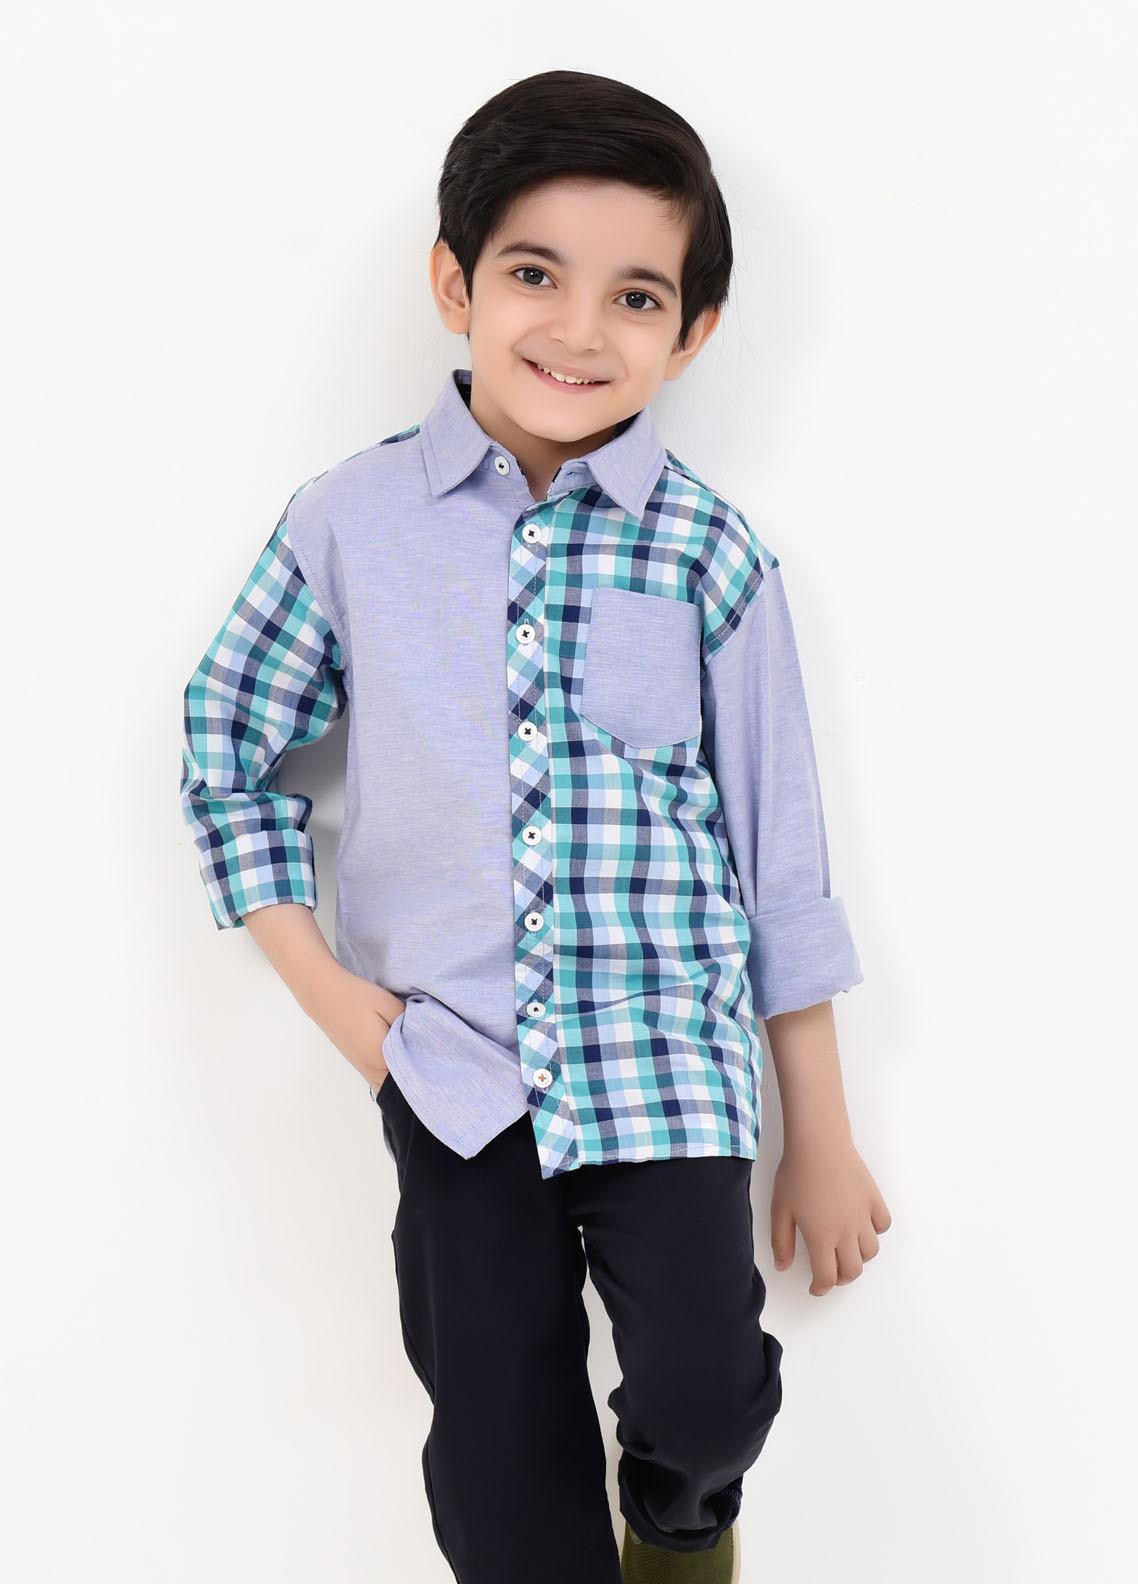 Ochre Cotton Casual Boys Shirts -  OBS-20 Light Blue